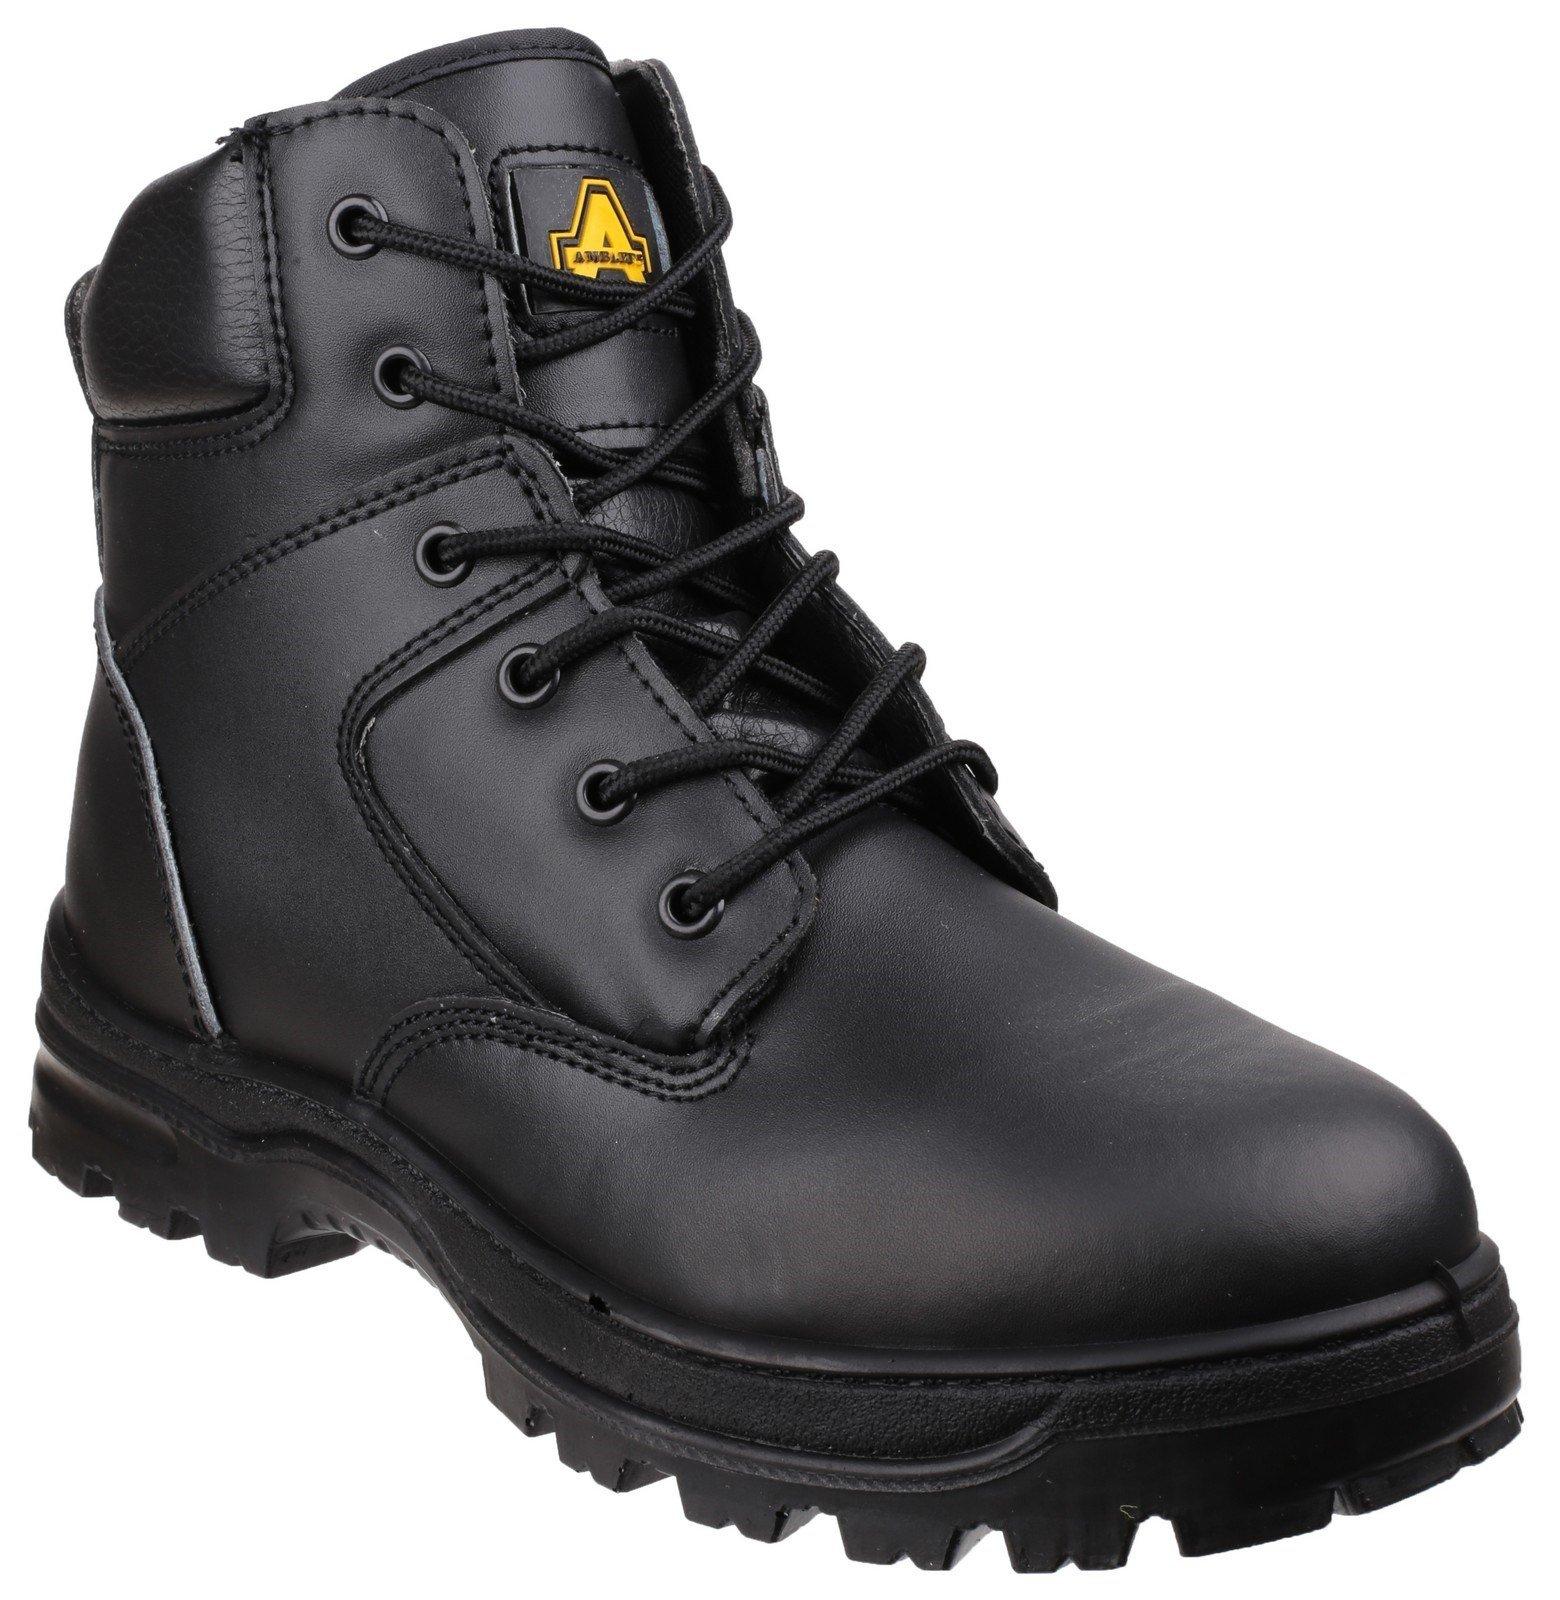 Amblers Unisex Safety Antistatic Lace up Boot Black 22387 - Black 4